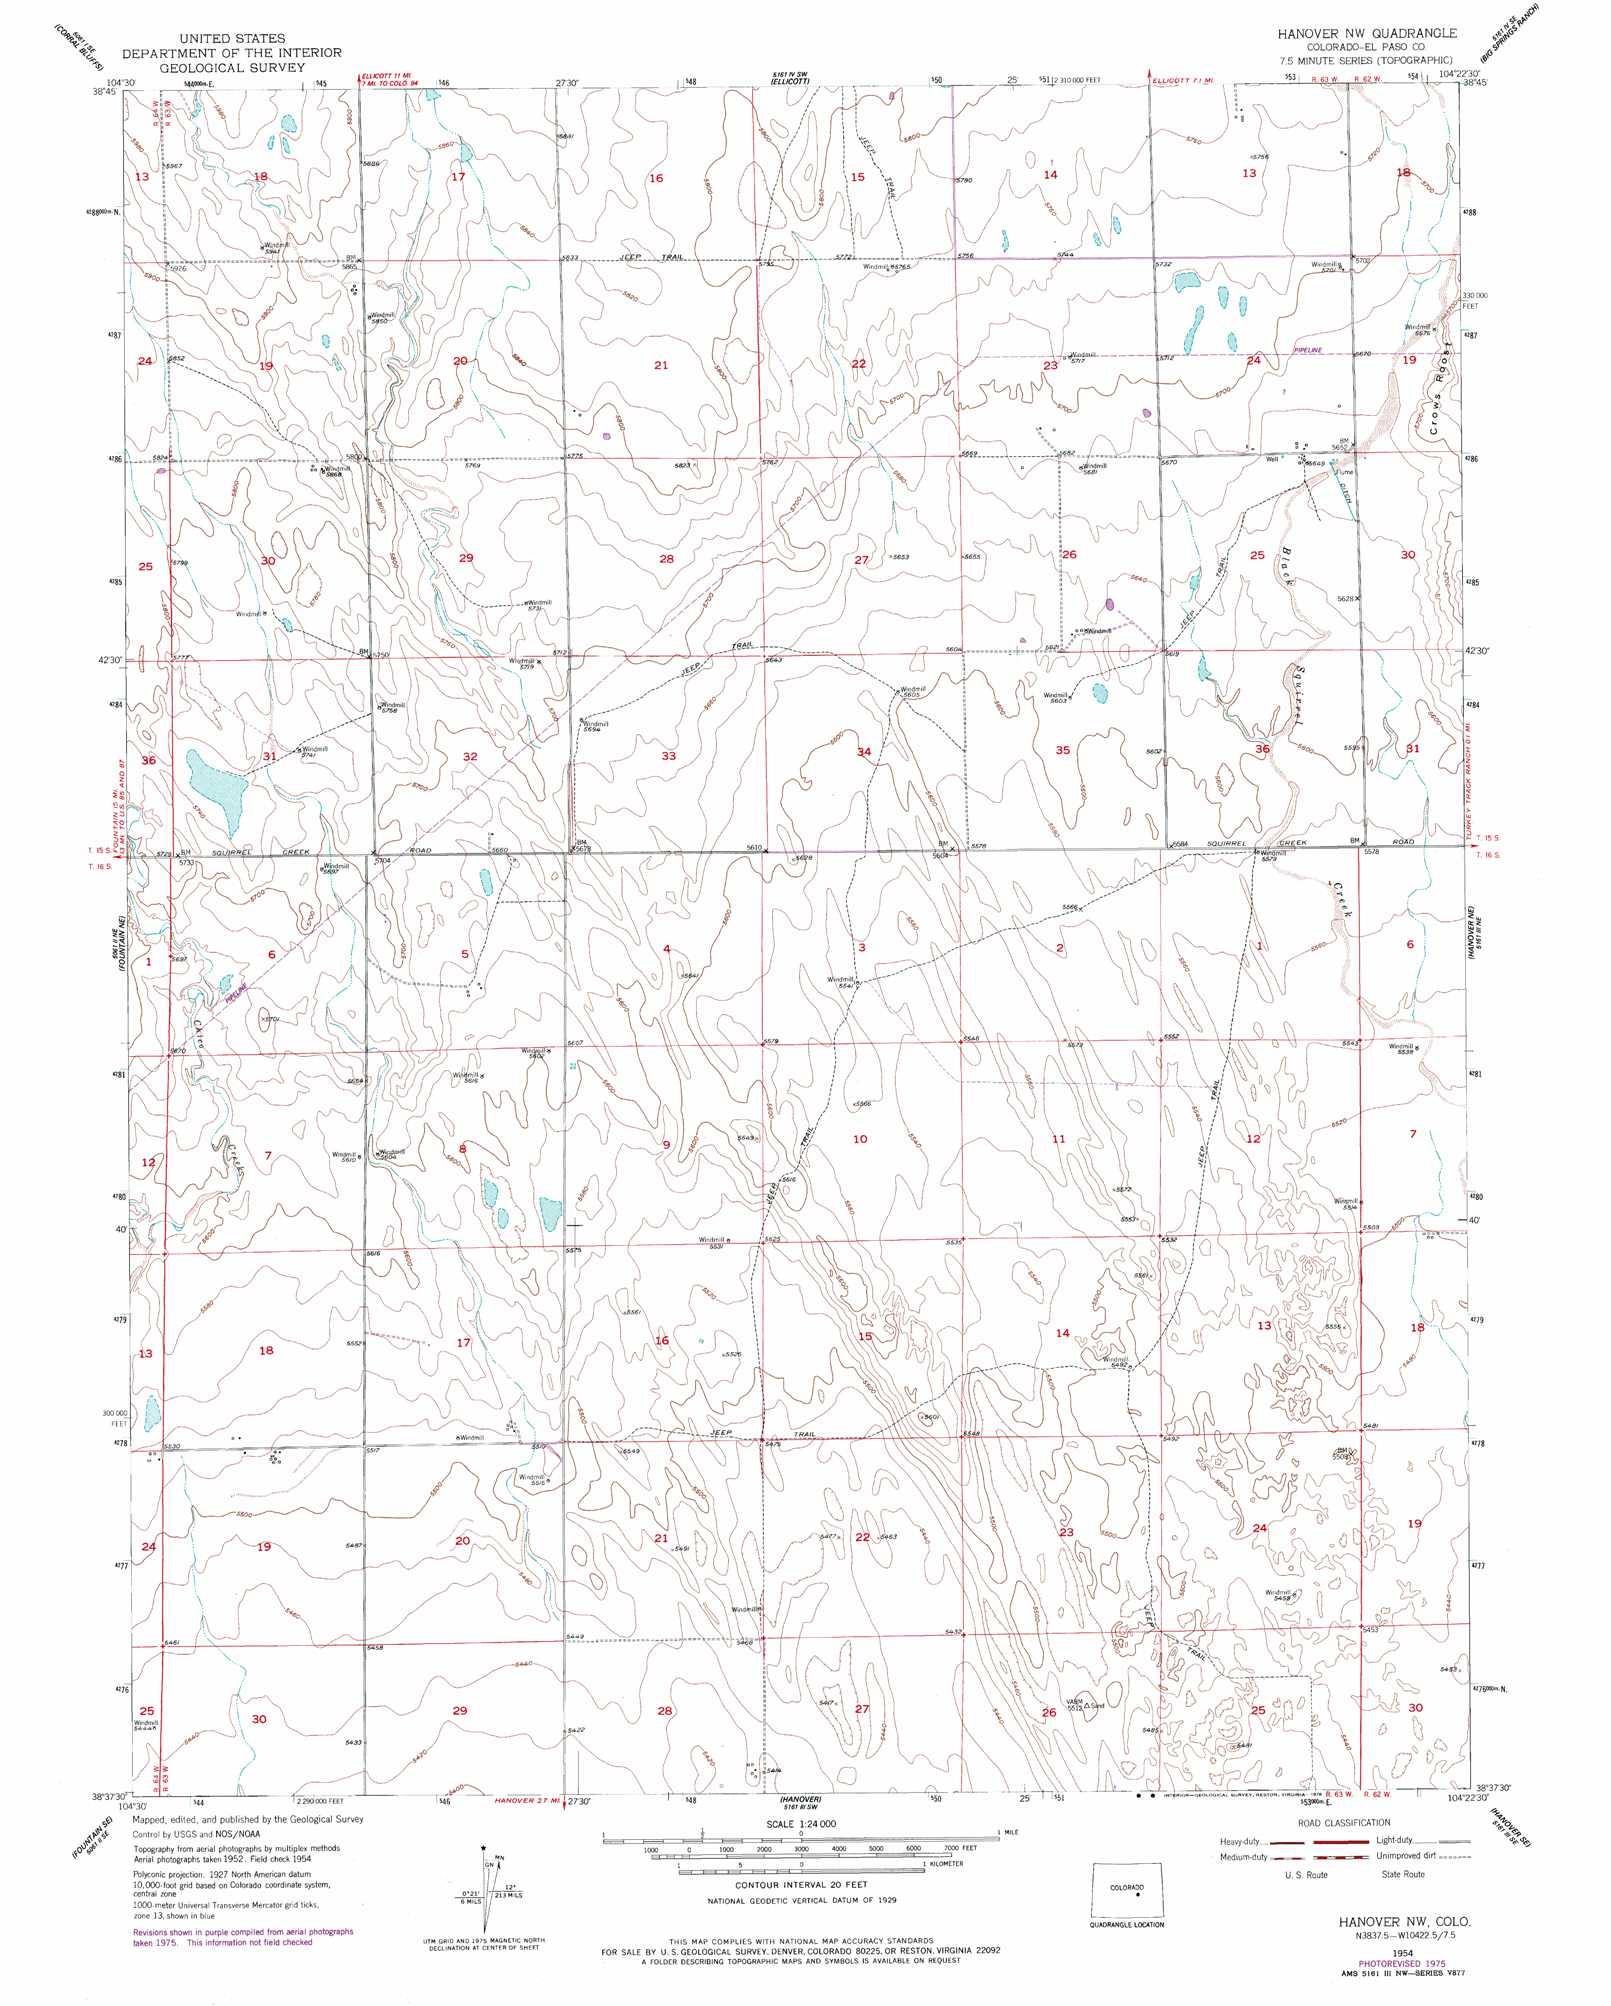 Hanover Nw Topographic Map Co Usgs Topo Quad 38104f4